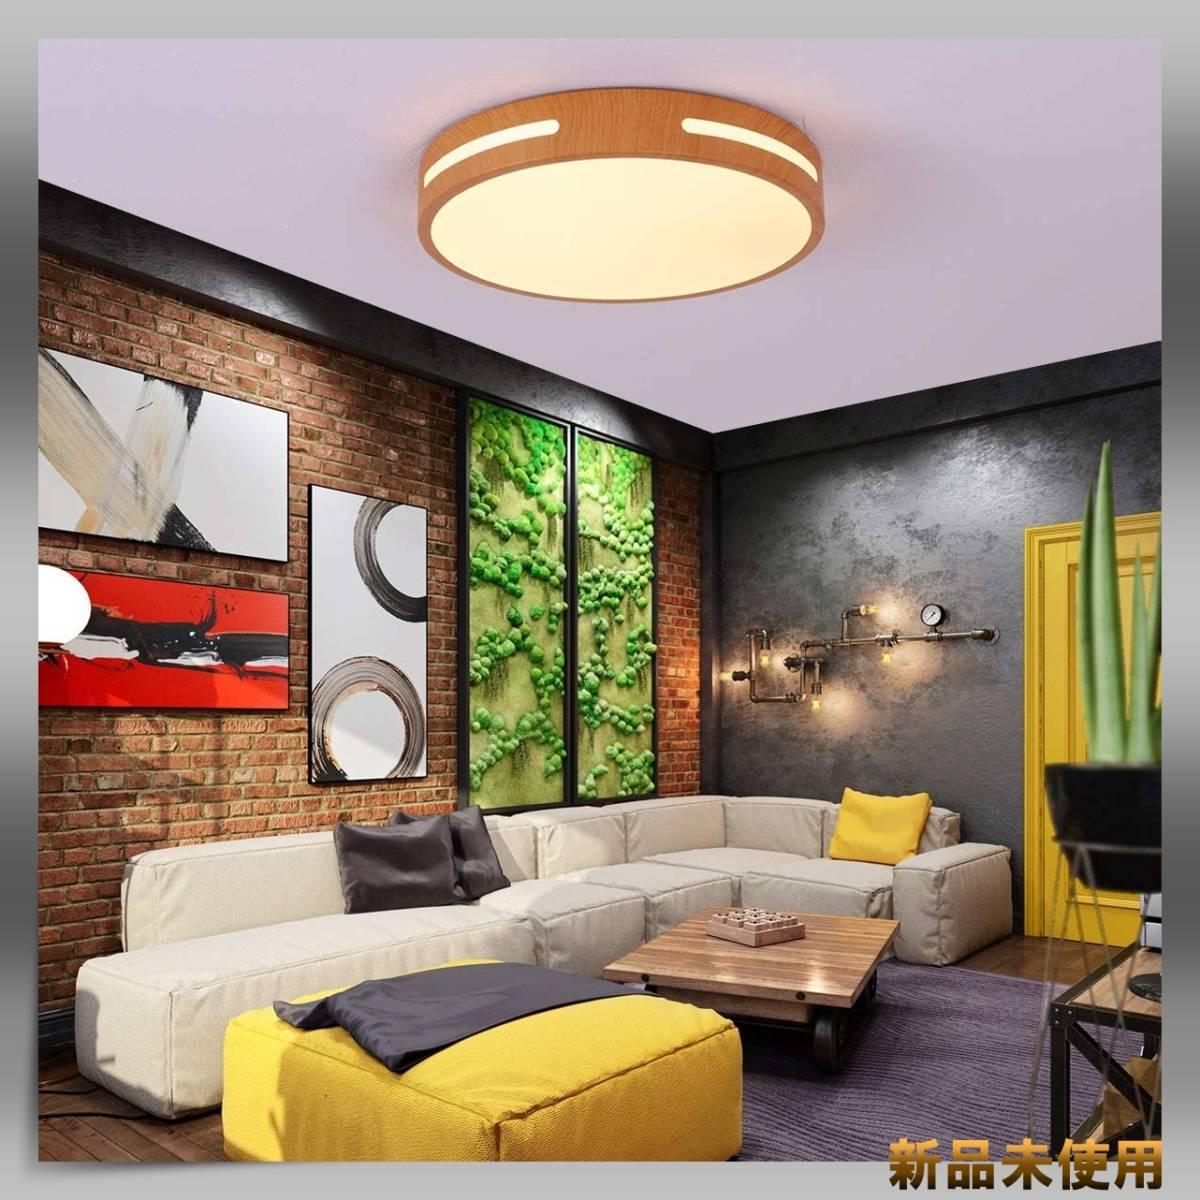 LEDシーリングライト 30W 天井照明器具 木目調 和風 薄型 シーリングライト 無段階調光調色 リモコン付き_画像9